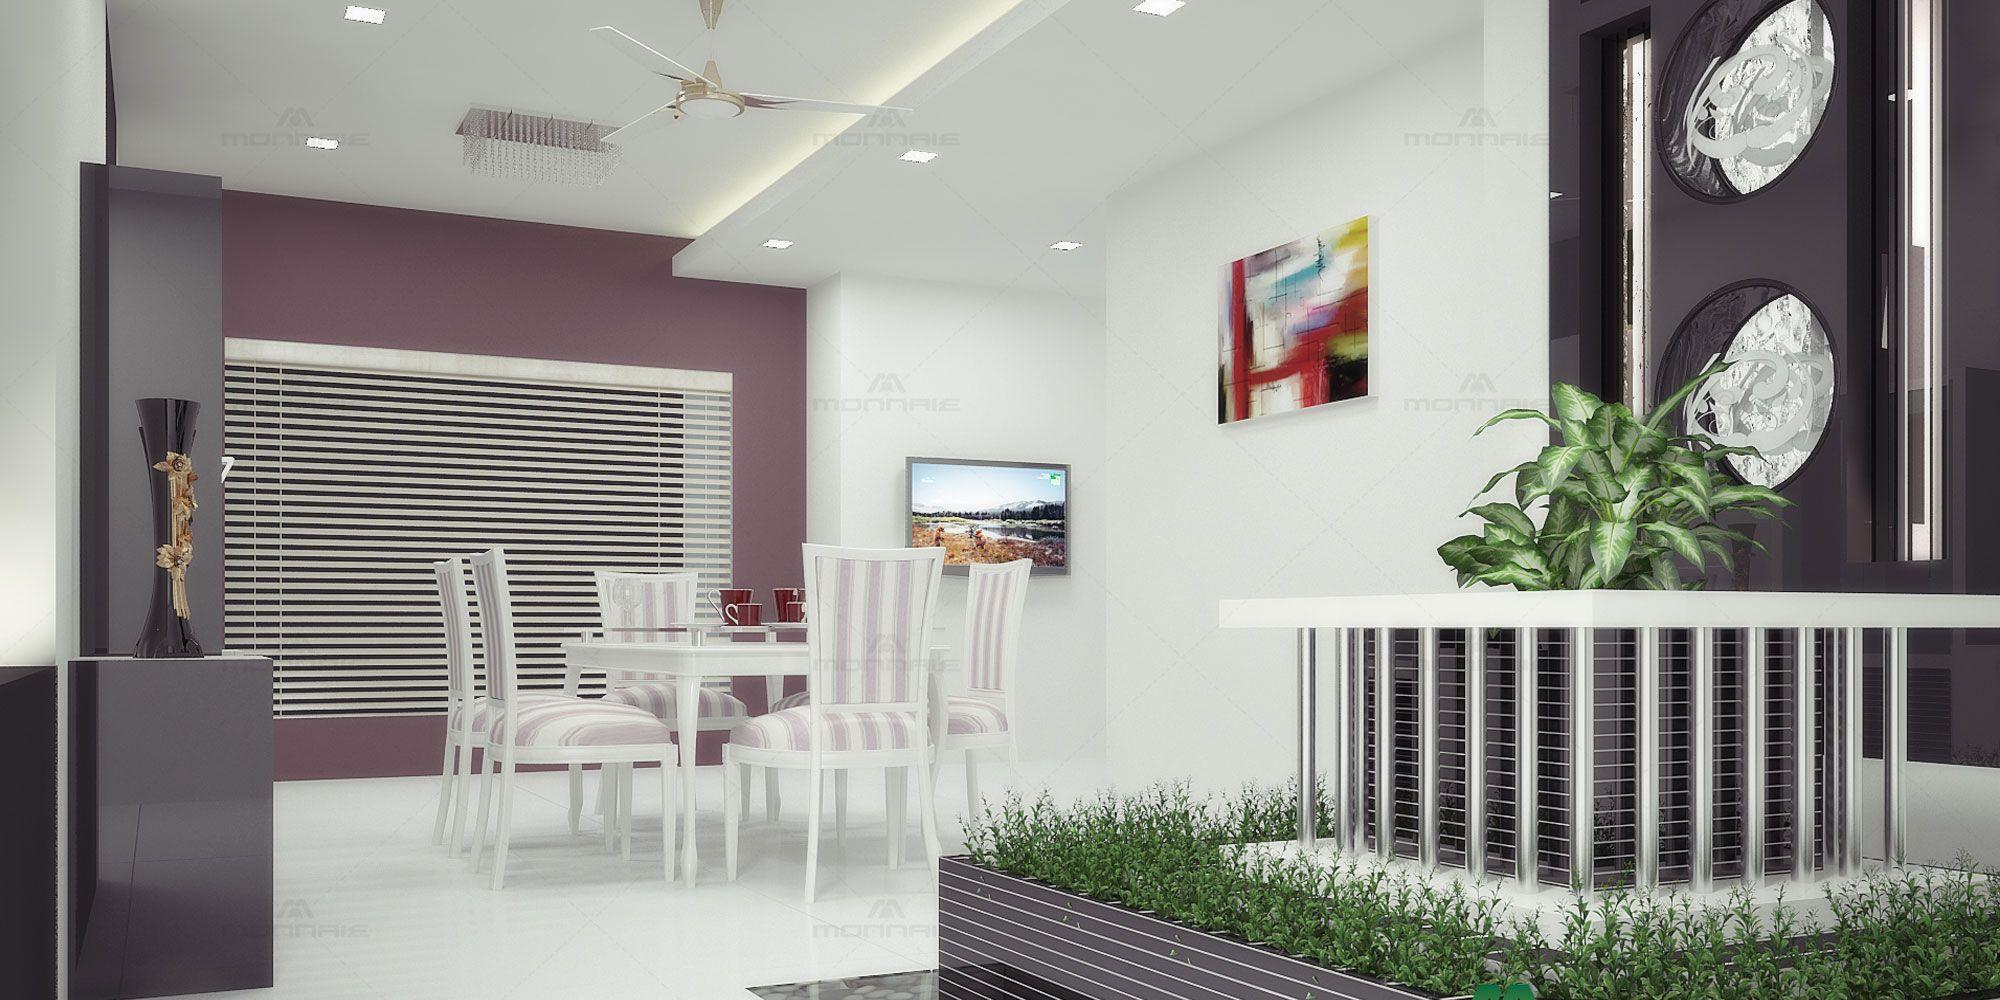 D'life home interiors - kottayam kottayam kerala pin by monnaie architects and interiors on interior designers